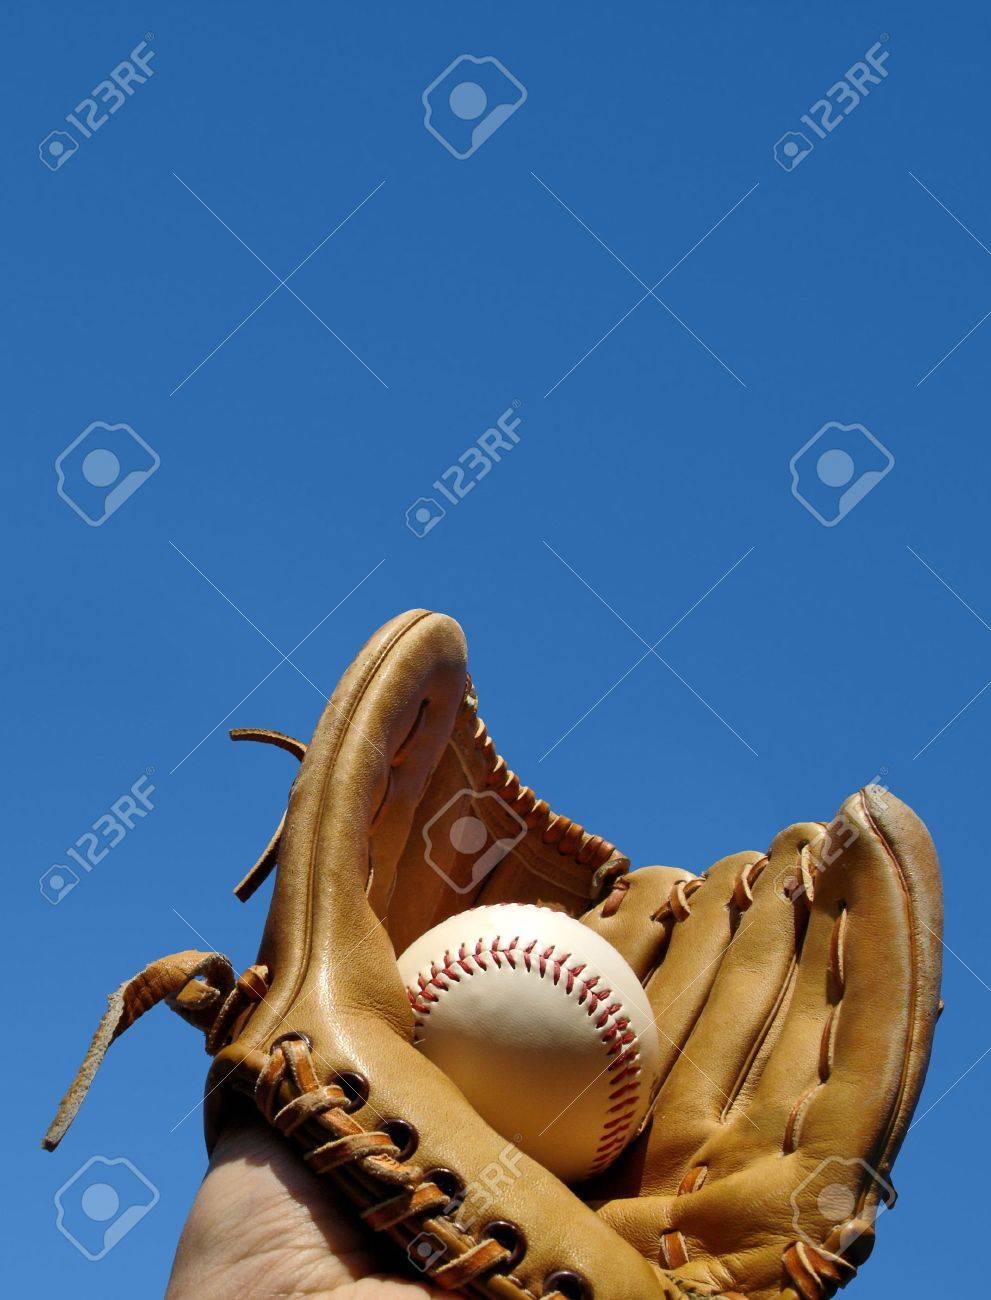 Baseball Catch Portrait Stock Photo - 3657532